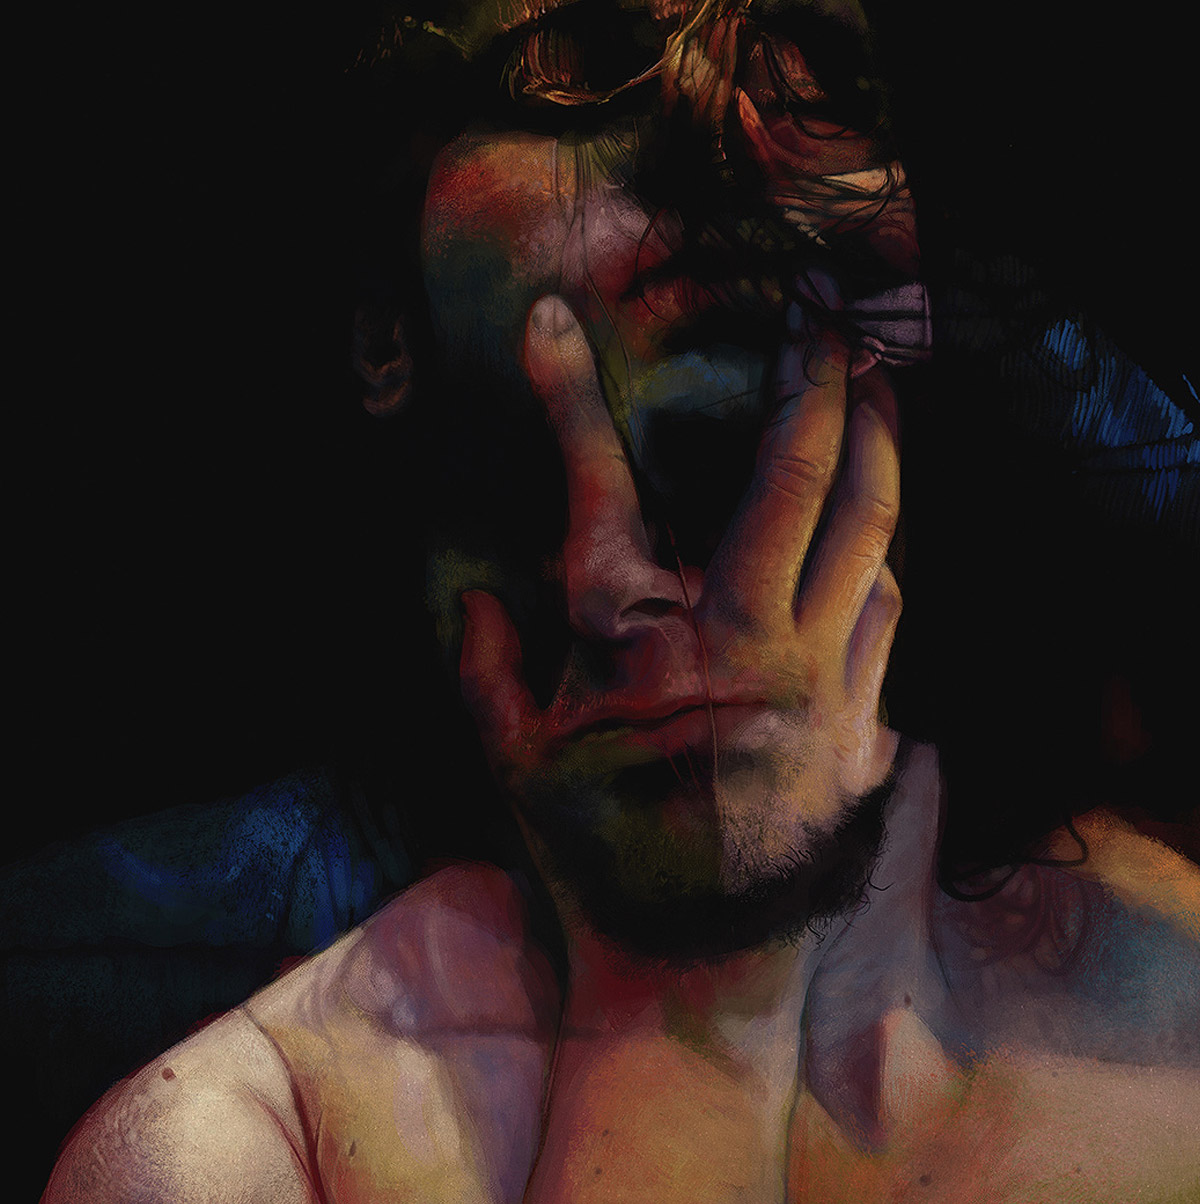 Digital Paintings by Mikolaj Birek